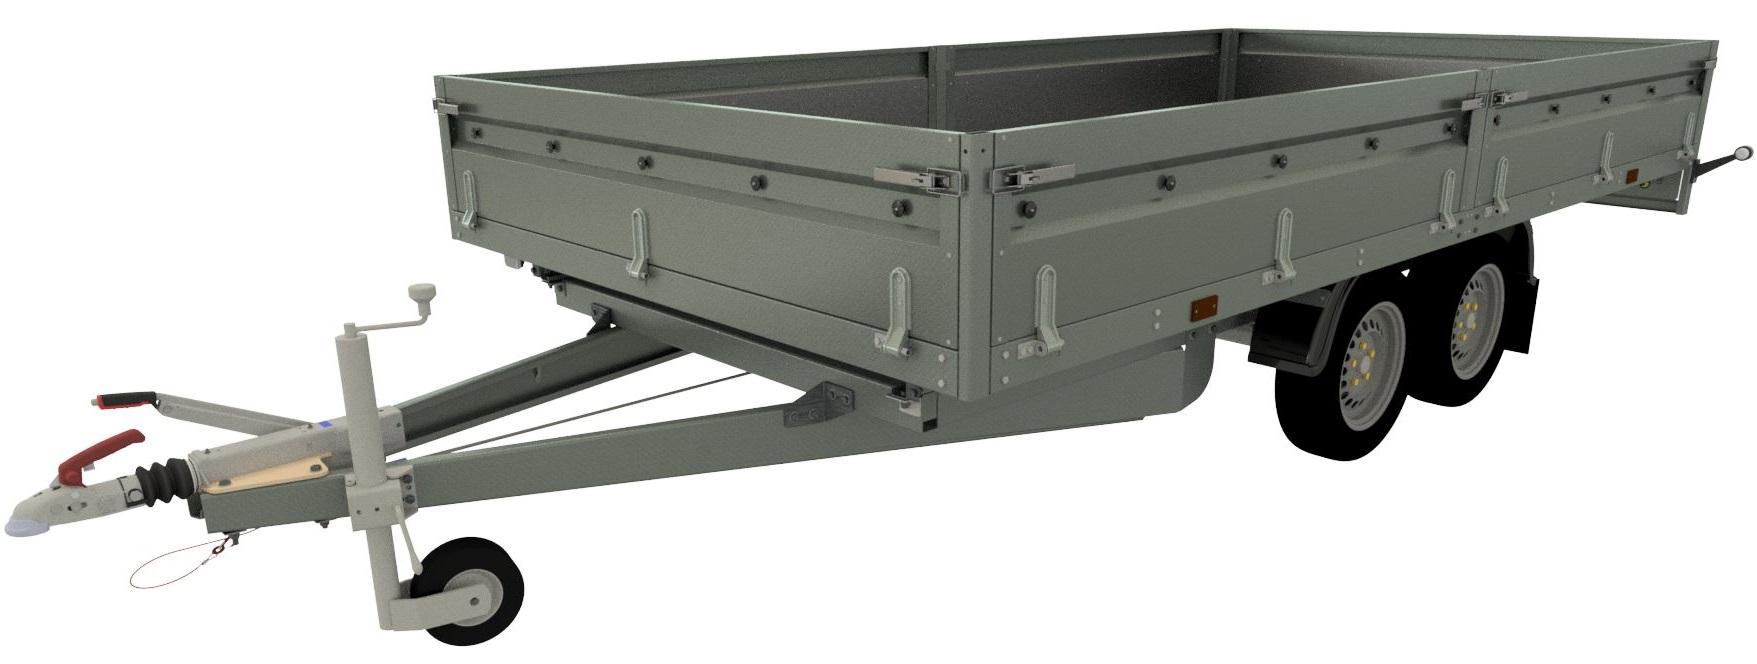 N20-420 2 kps [GN242]